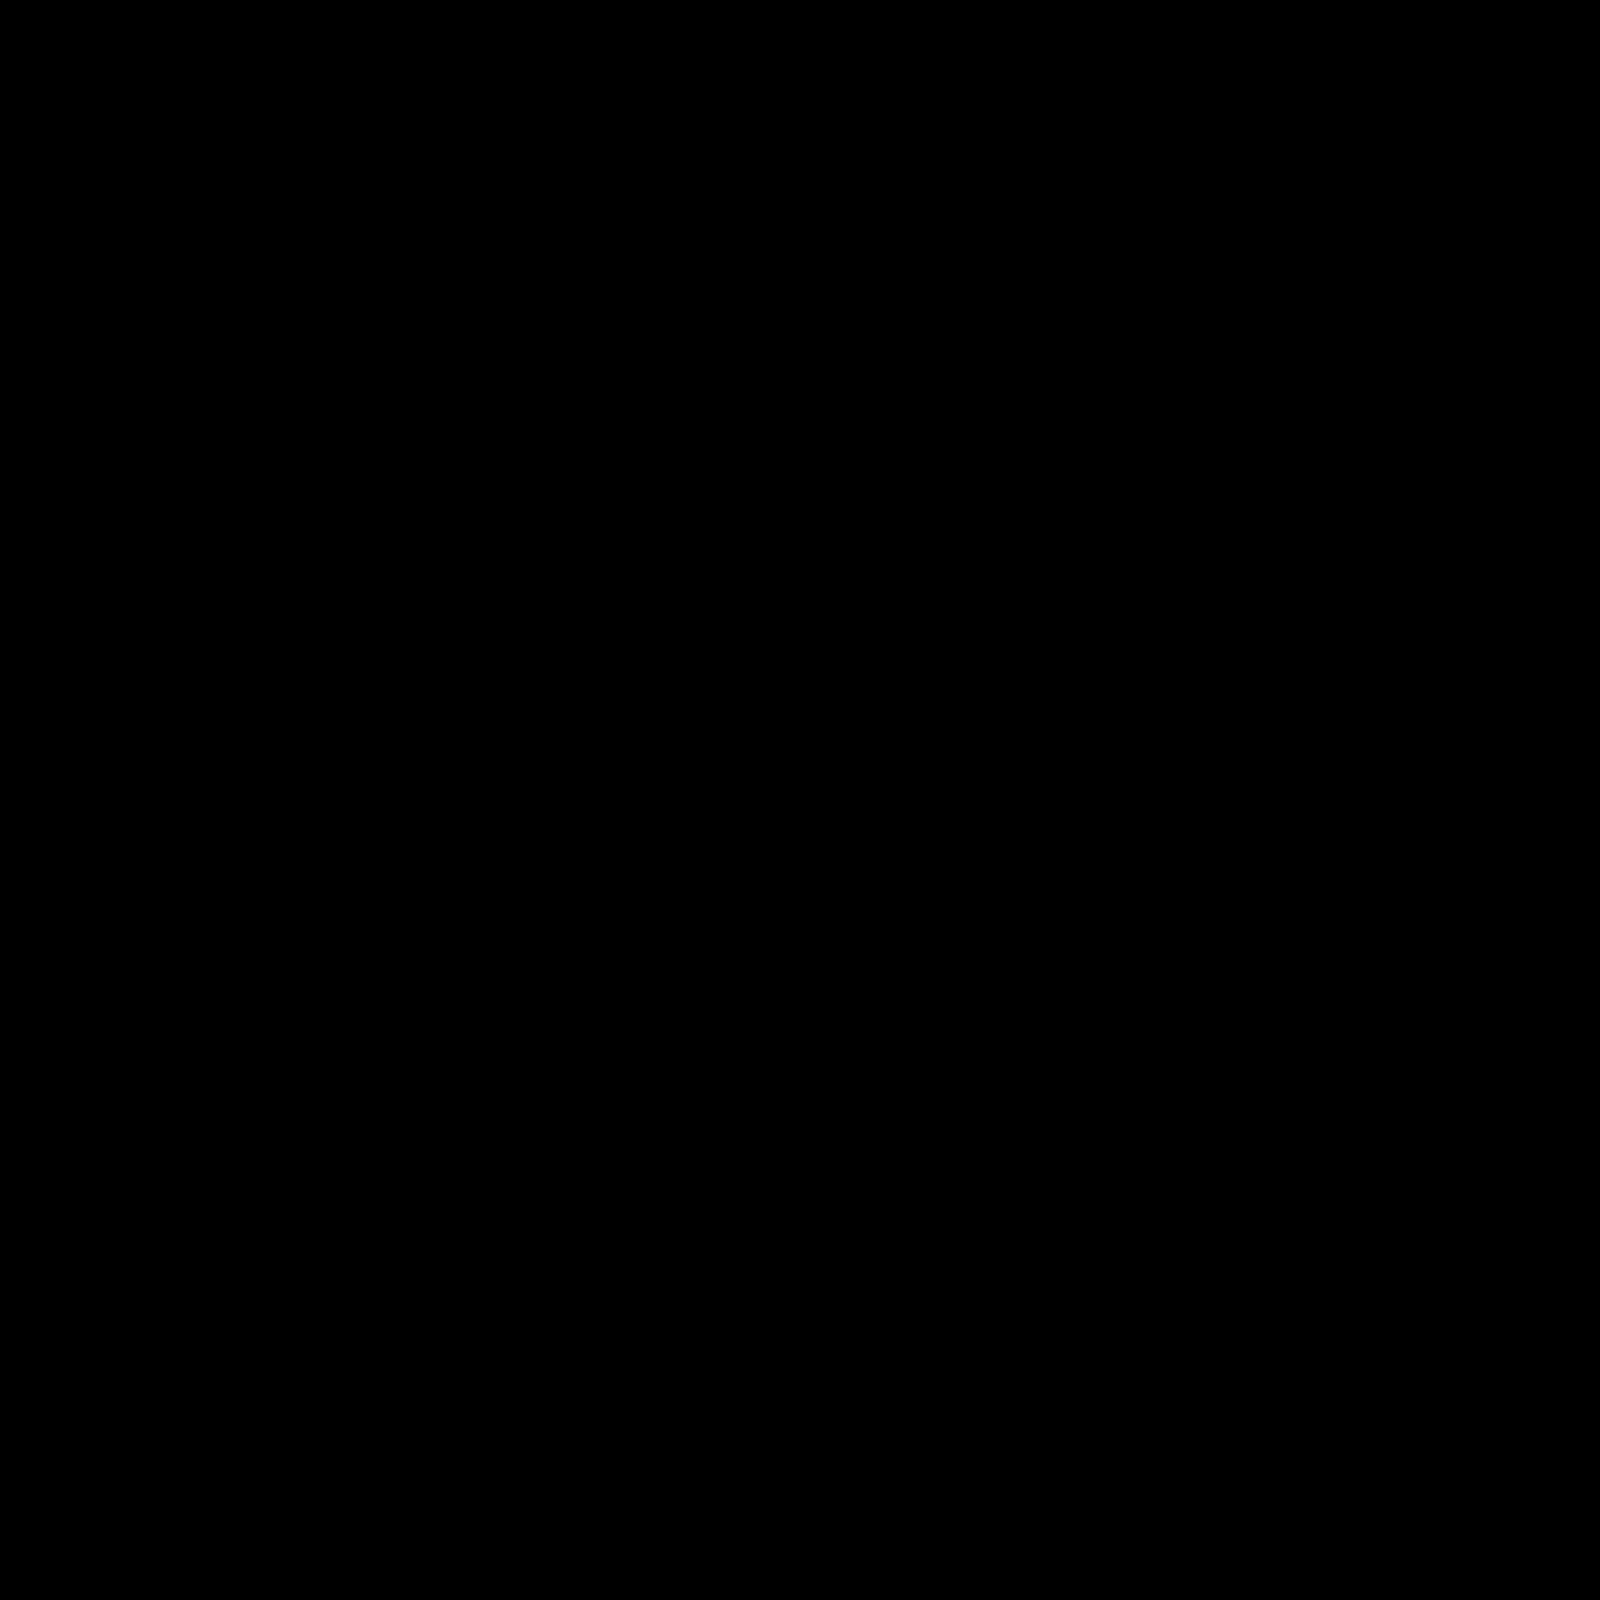 Lightning clipart emoji, Lightning emoji Transparent FREE